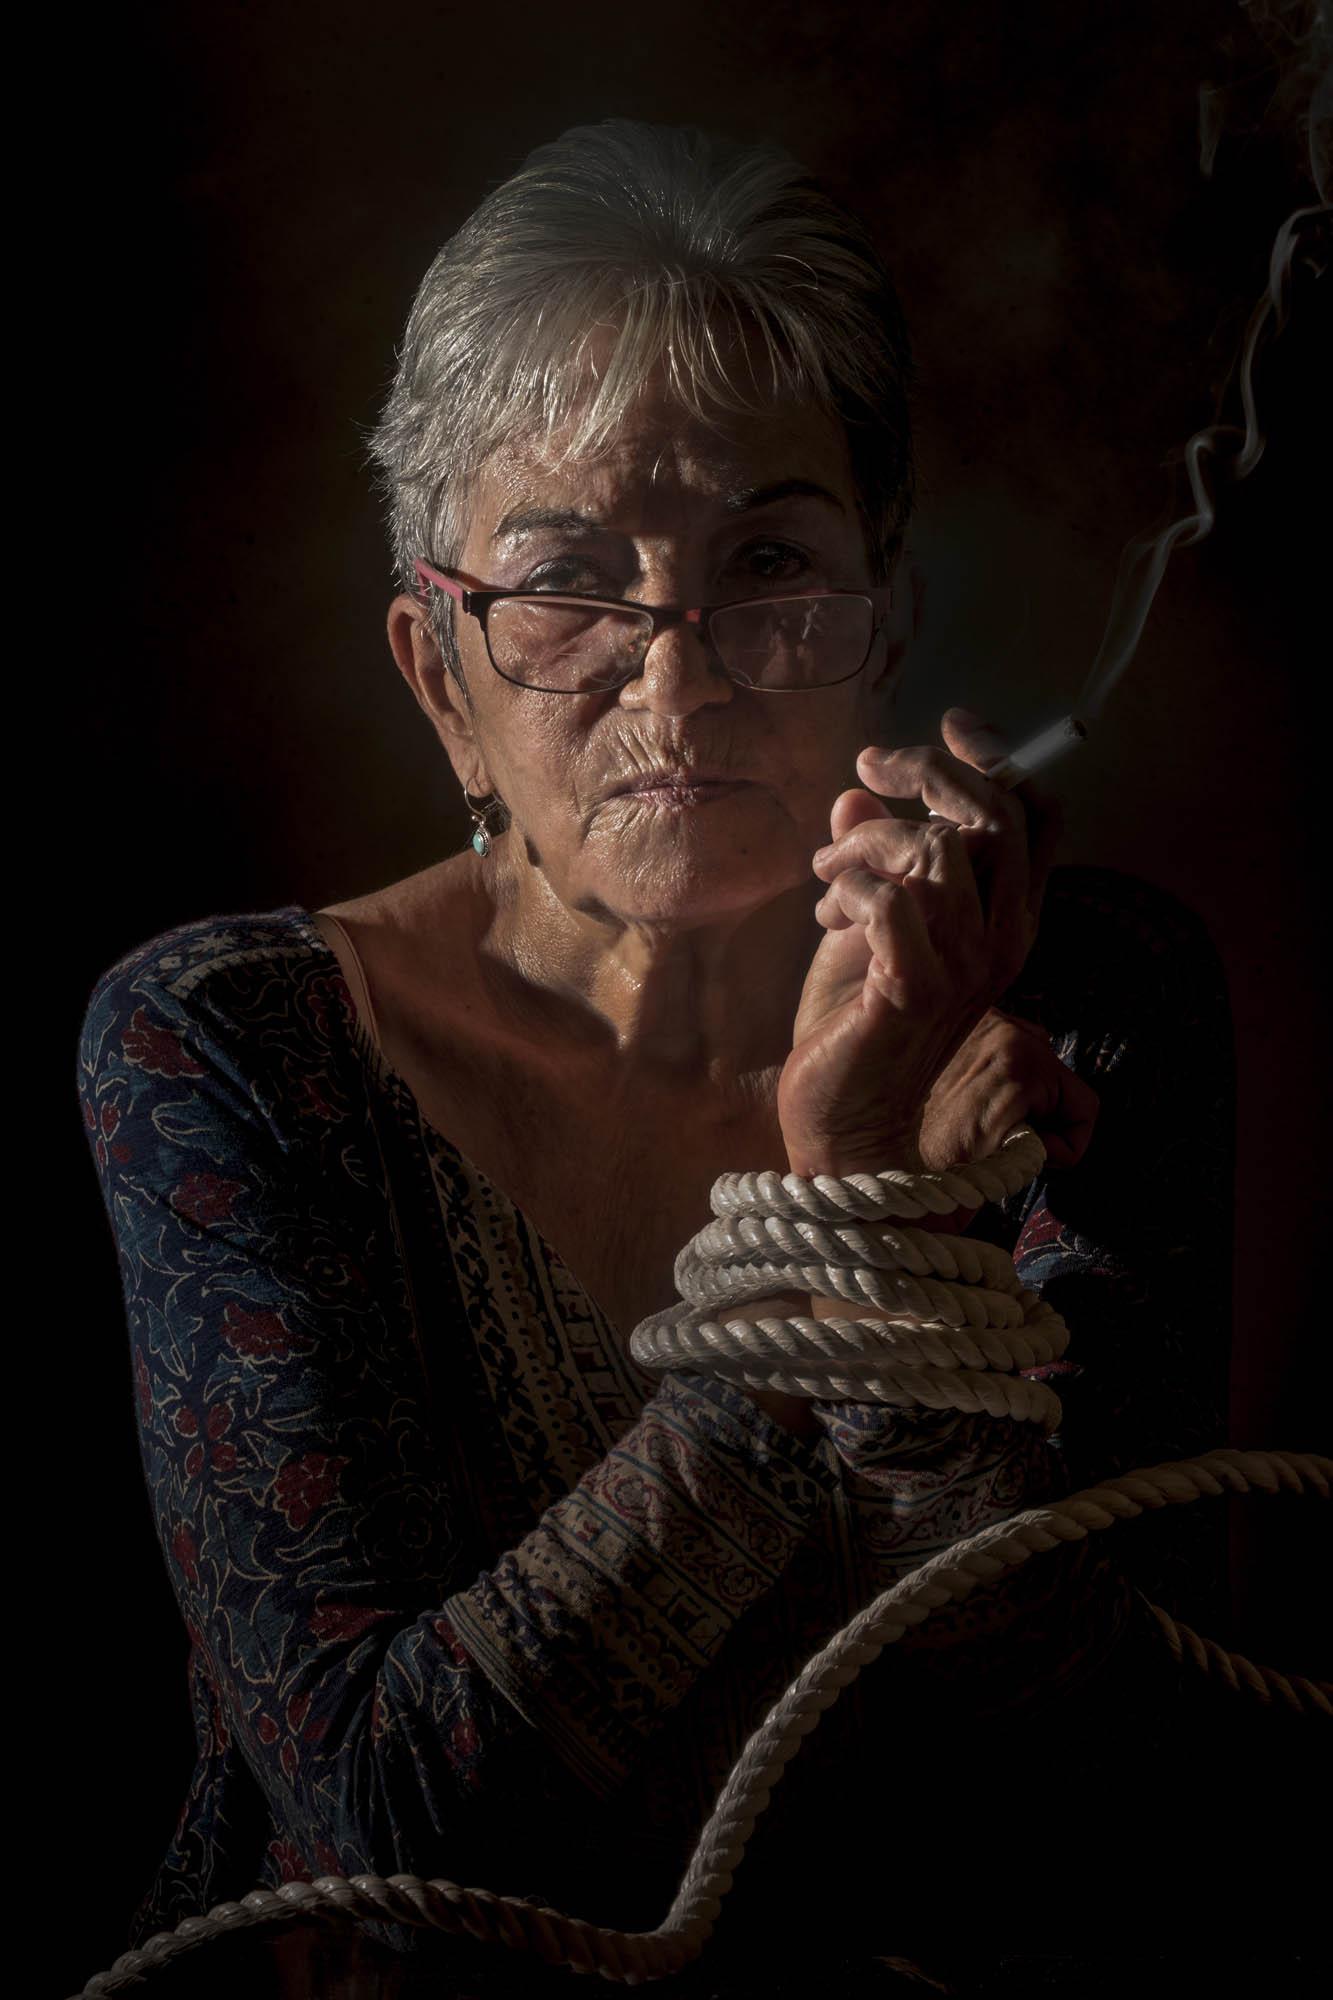 Lichi - Cuba - Hector Garrido, Aerial and human photography